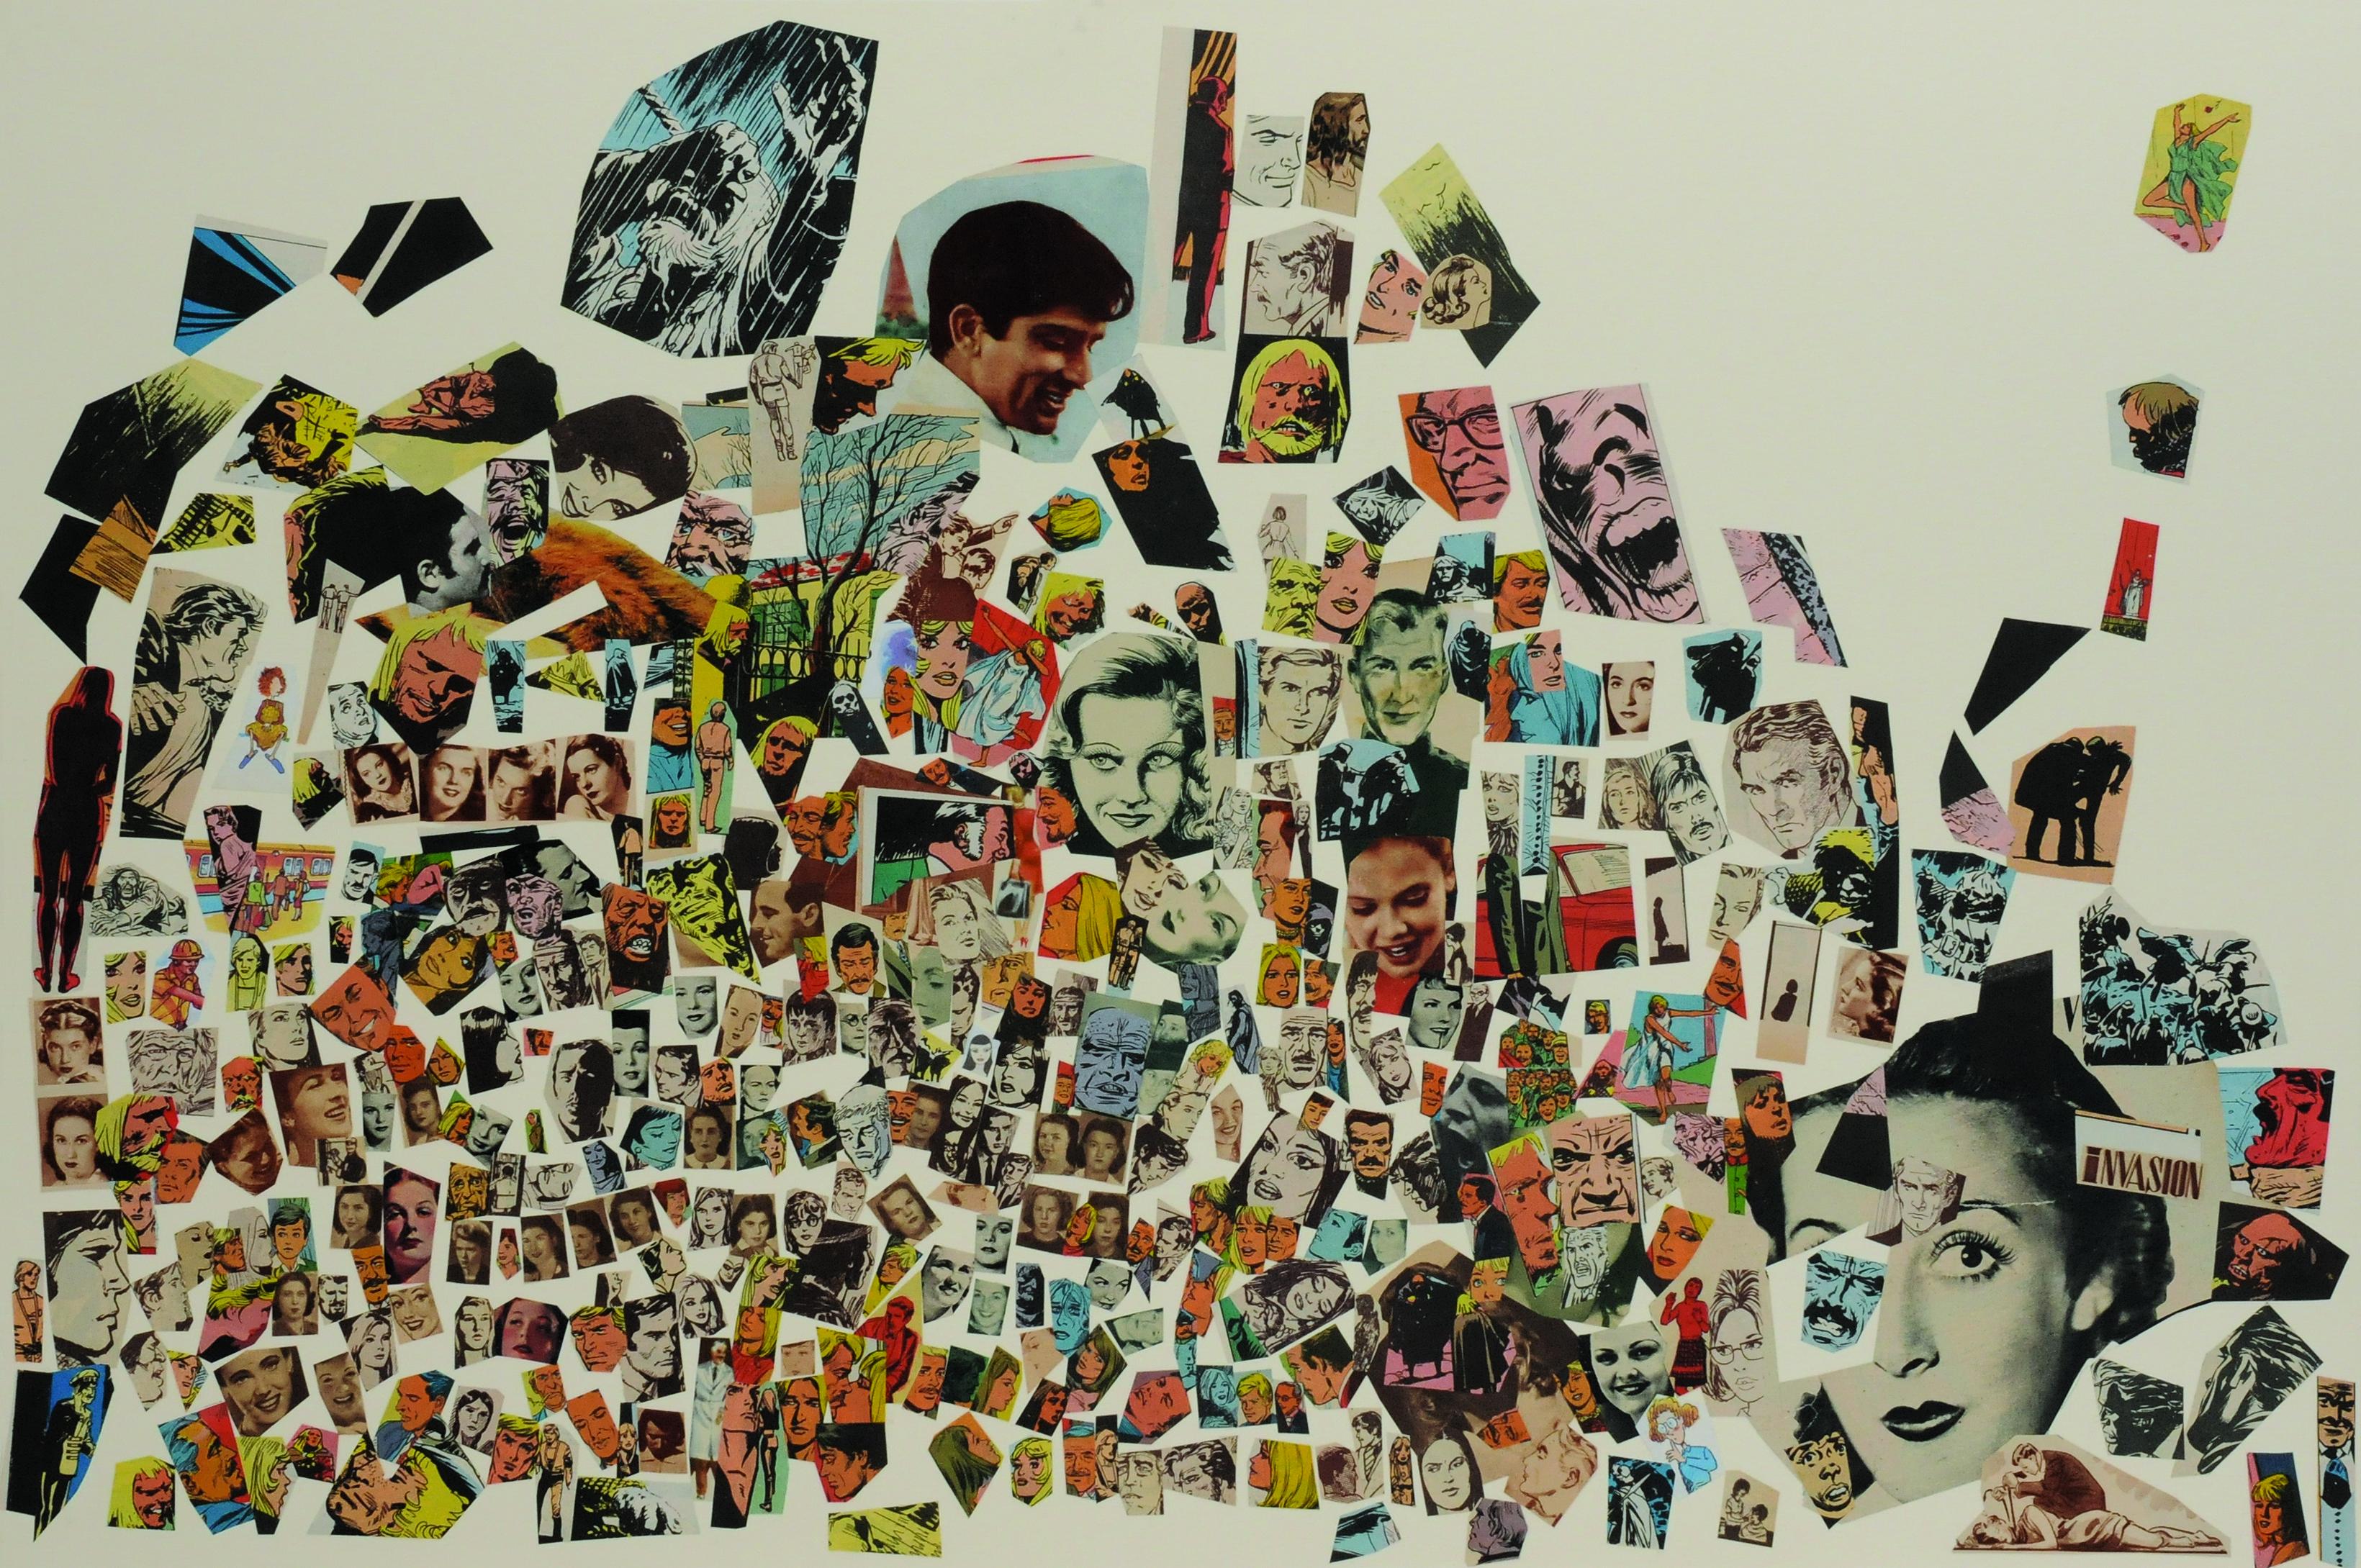 Invasión, papel collage, 51 cm x 76 cm. 2008